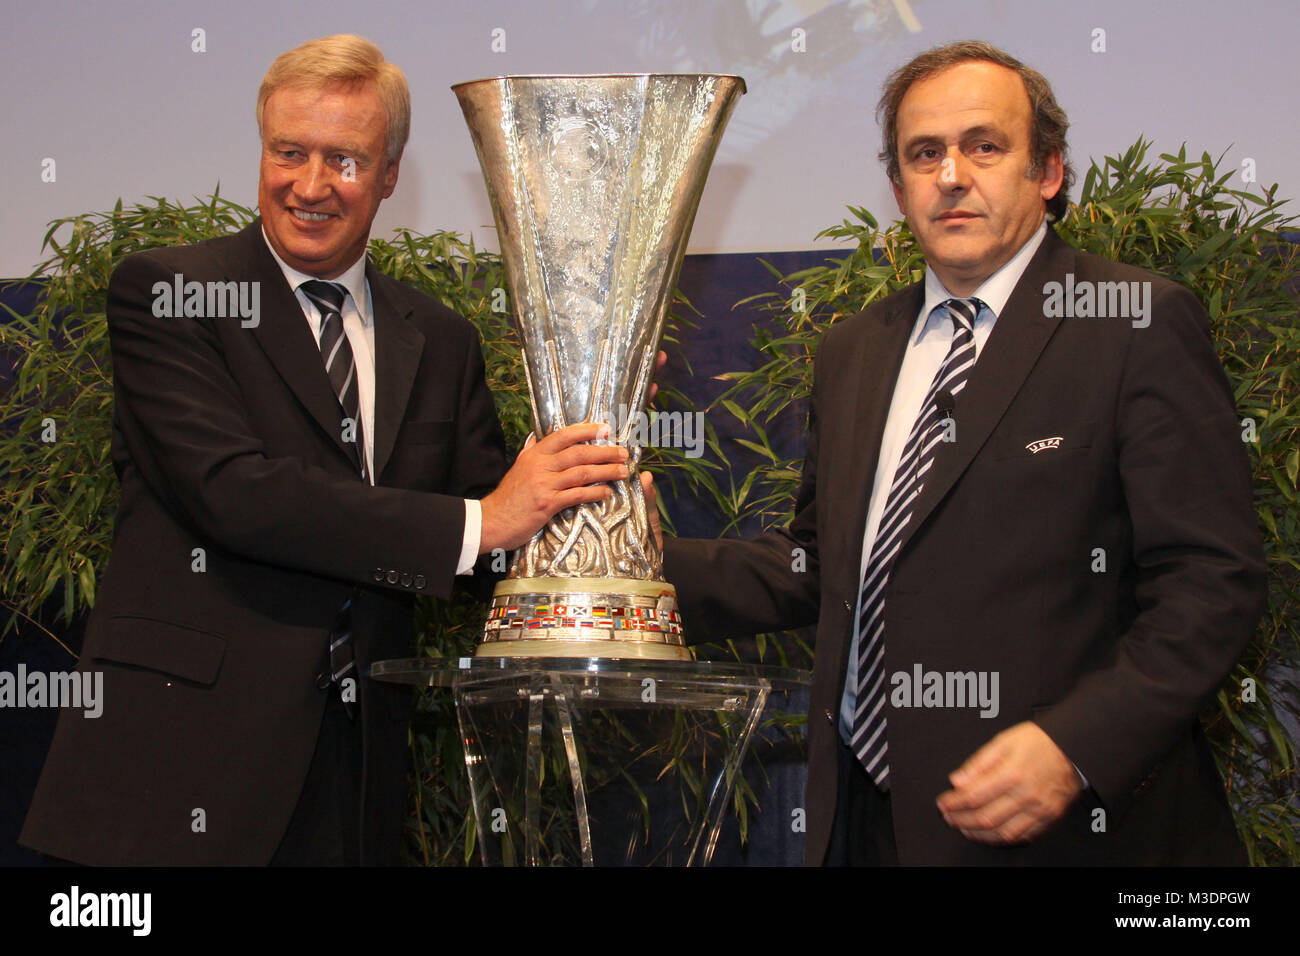 UEFA Europa League Finale 2010 Hamburg, Cup Handover - Pokalübergabe an Bürgermeister Ole von Beust, Hamburg - Stock Image